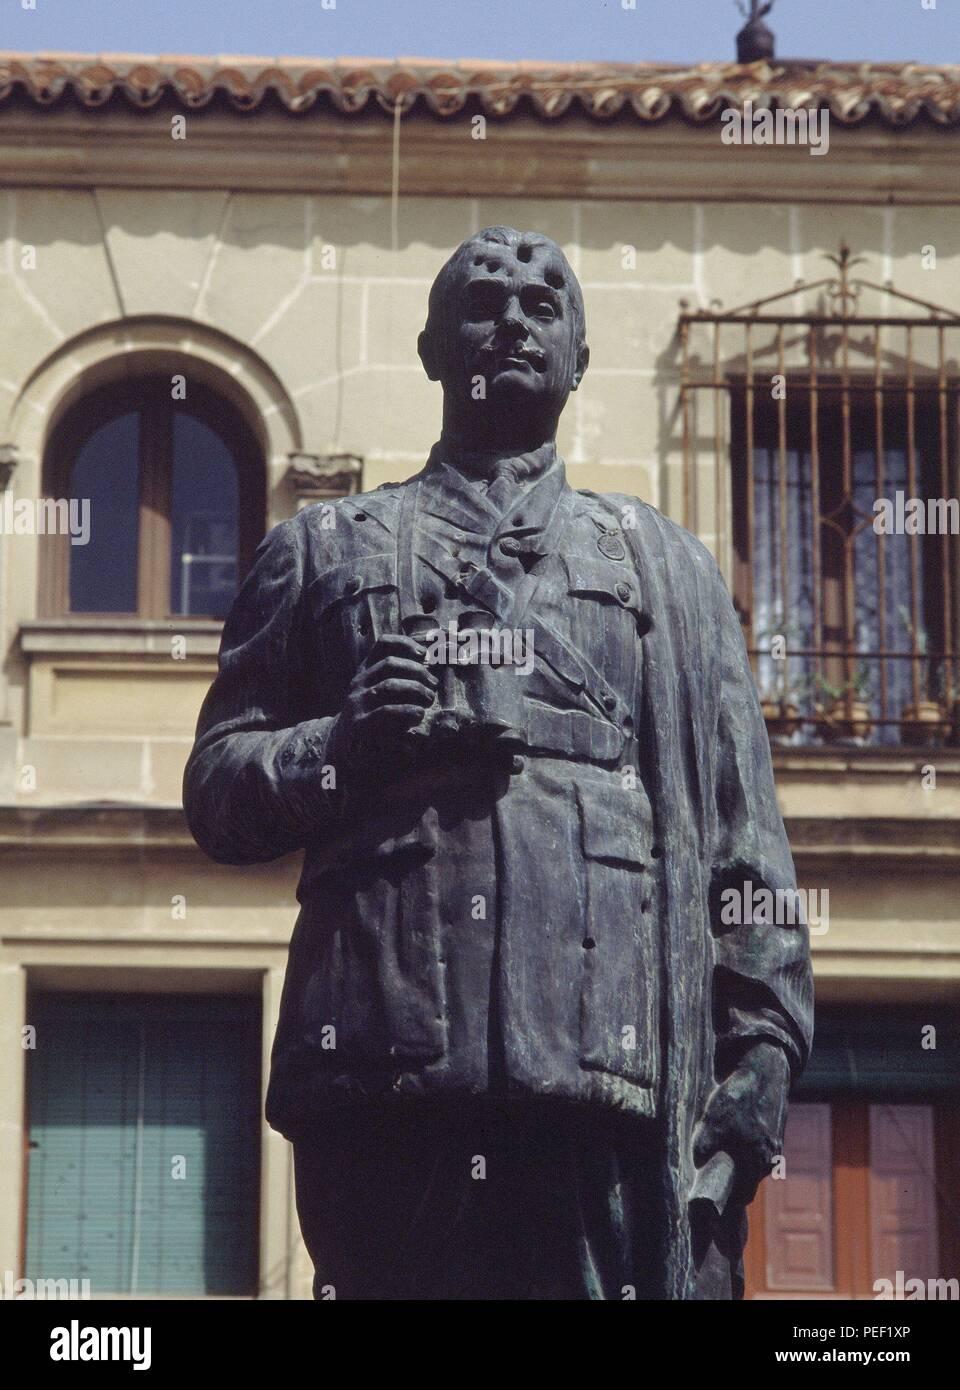 MONUMENTO AL EXCMO GRAL LEOPOLDO SARO MARIN-DET ESCULTURA. Location: EXTERIOR, UBEDA, JAEN, SPAIN. Stock Photo